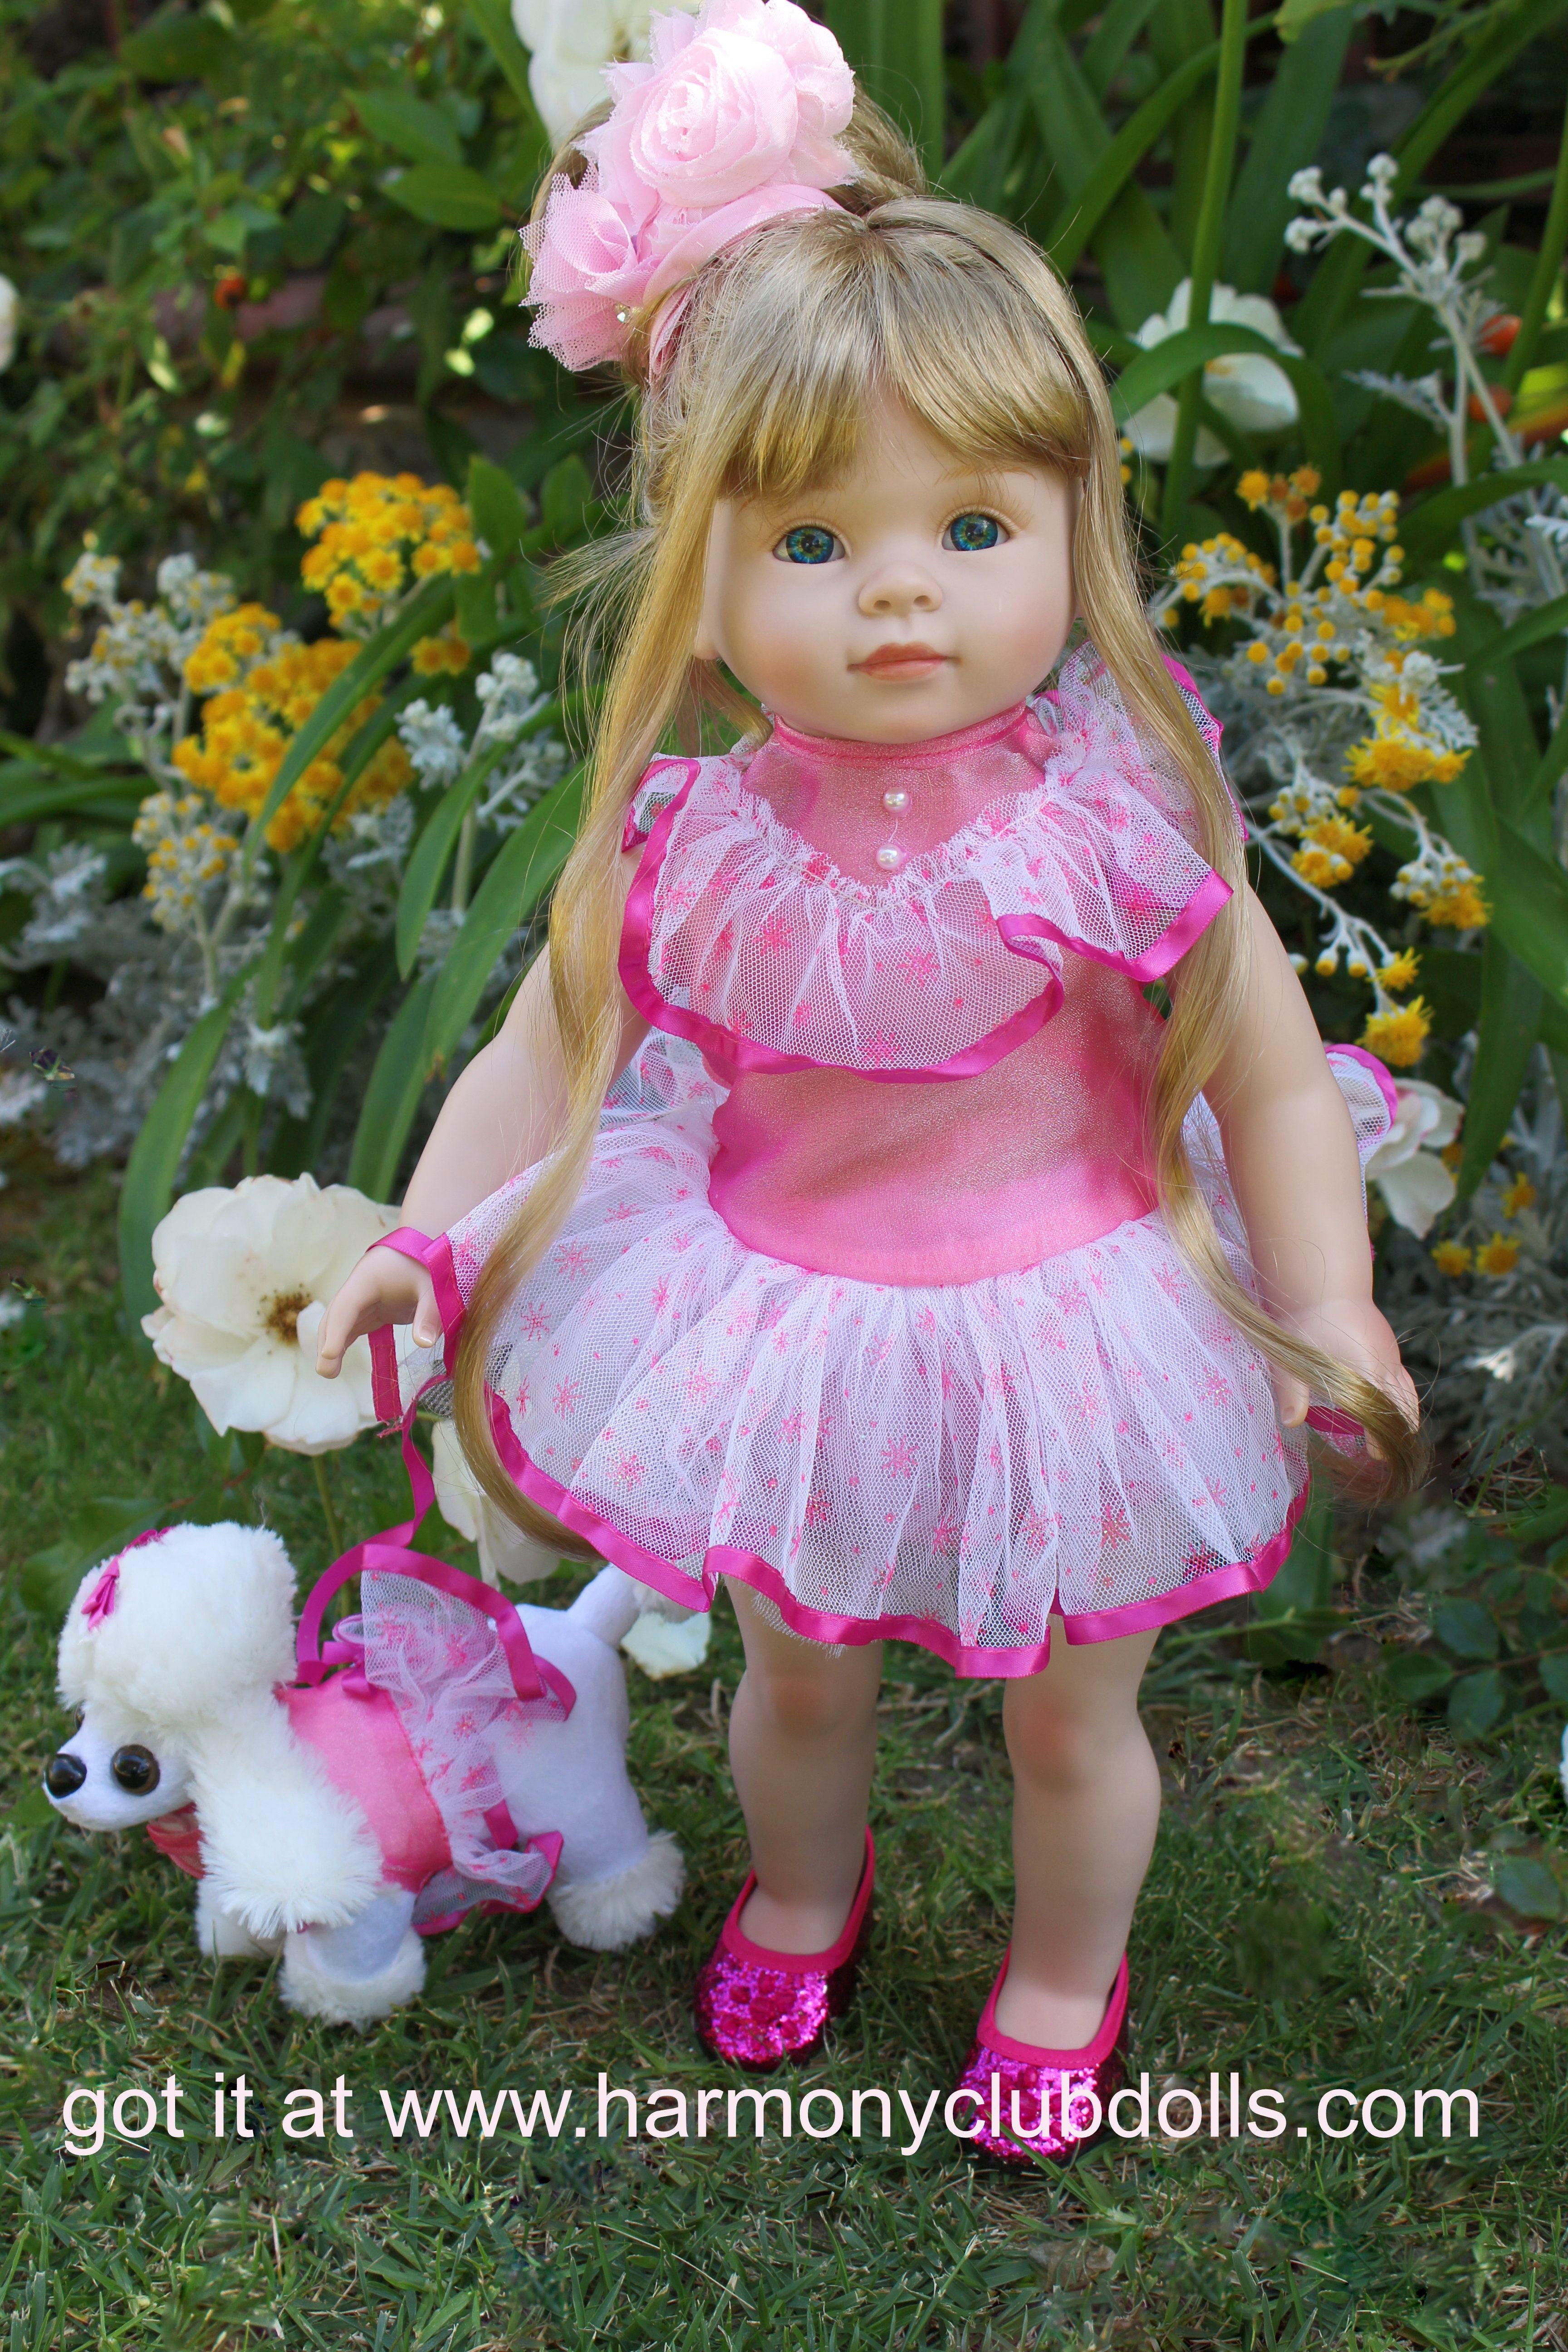 "HARMONY CLUB DOLLS 18"" Dolls and 18"" Doll clothes to fit American Girl. Visit www.harmonyclubdolls.com"